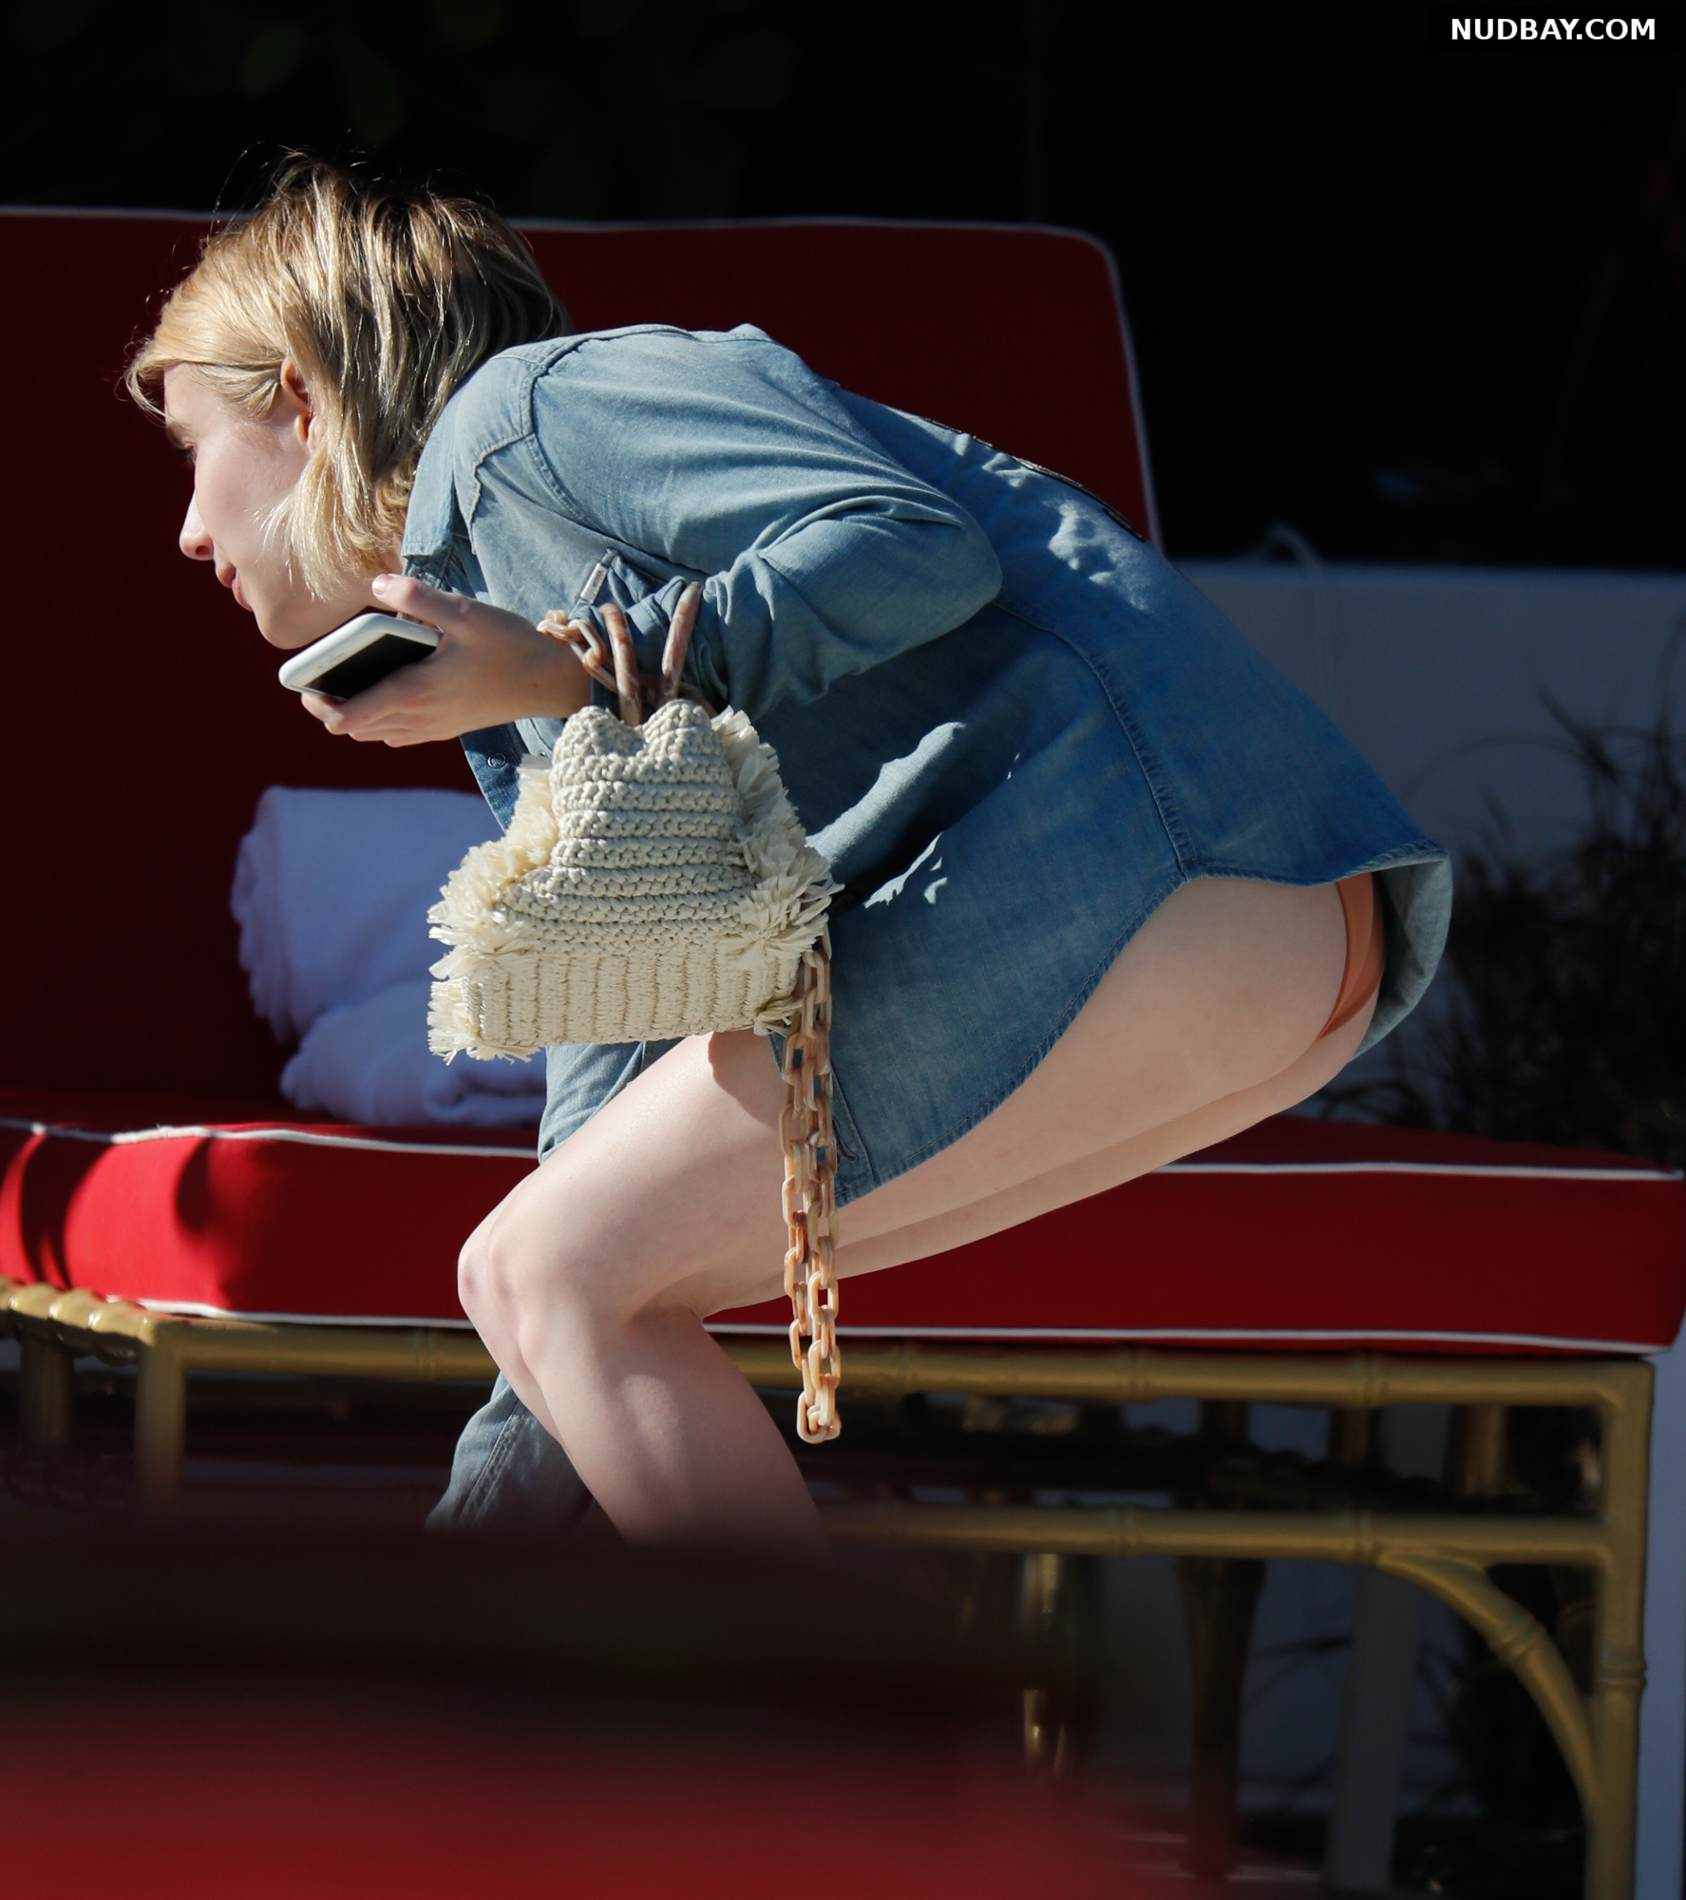 Emma Roberts ass bikini at the beach in Miami Dec 13 2017